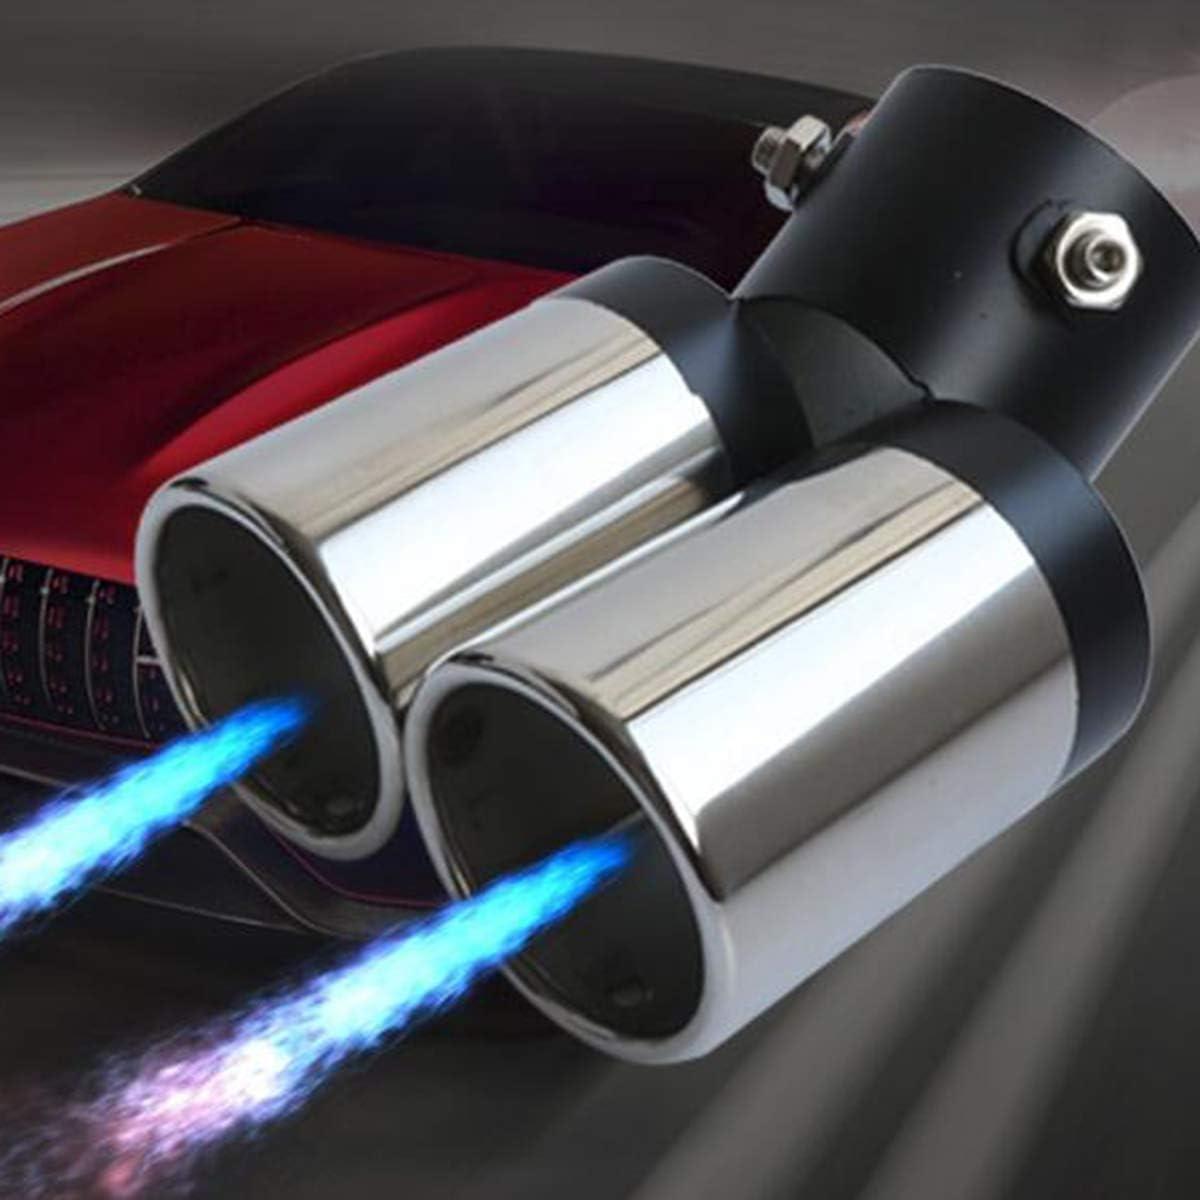 Sanon Universal Auto Fahrzeug Auspuff Edelstahl Biegen Doppelrohr Endrohr Auspuff Modifikation Auto